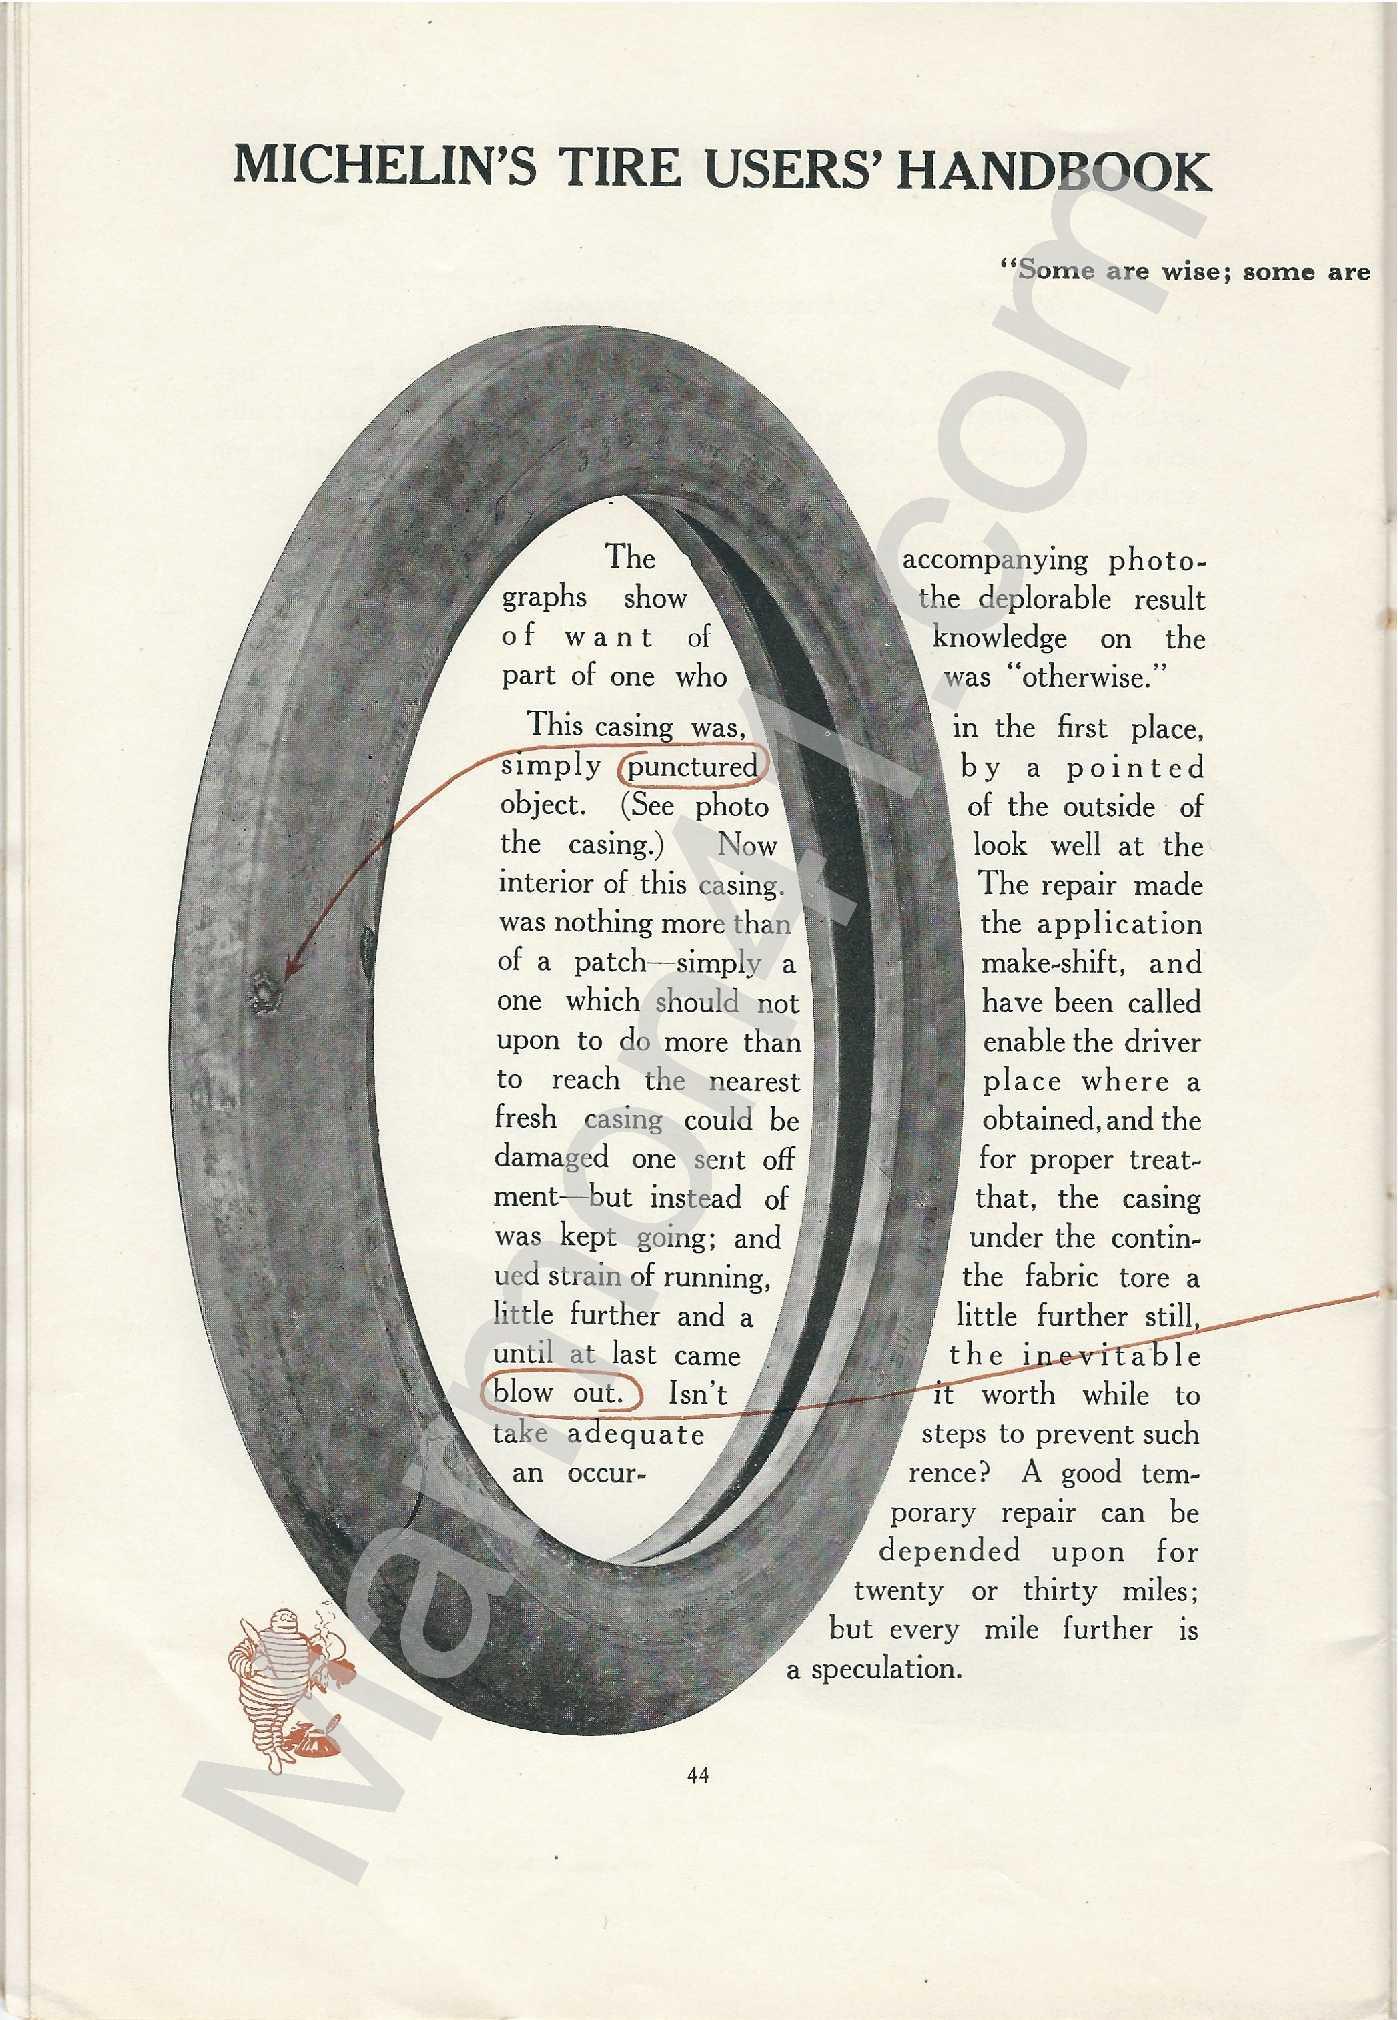 Michelins Tire Users Handbook_44